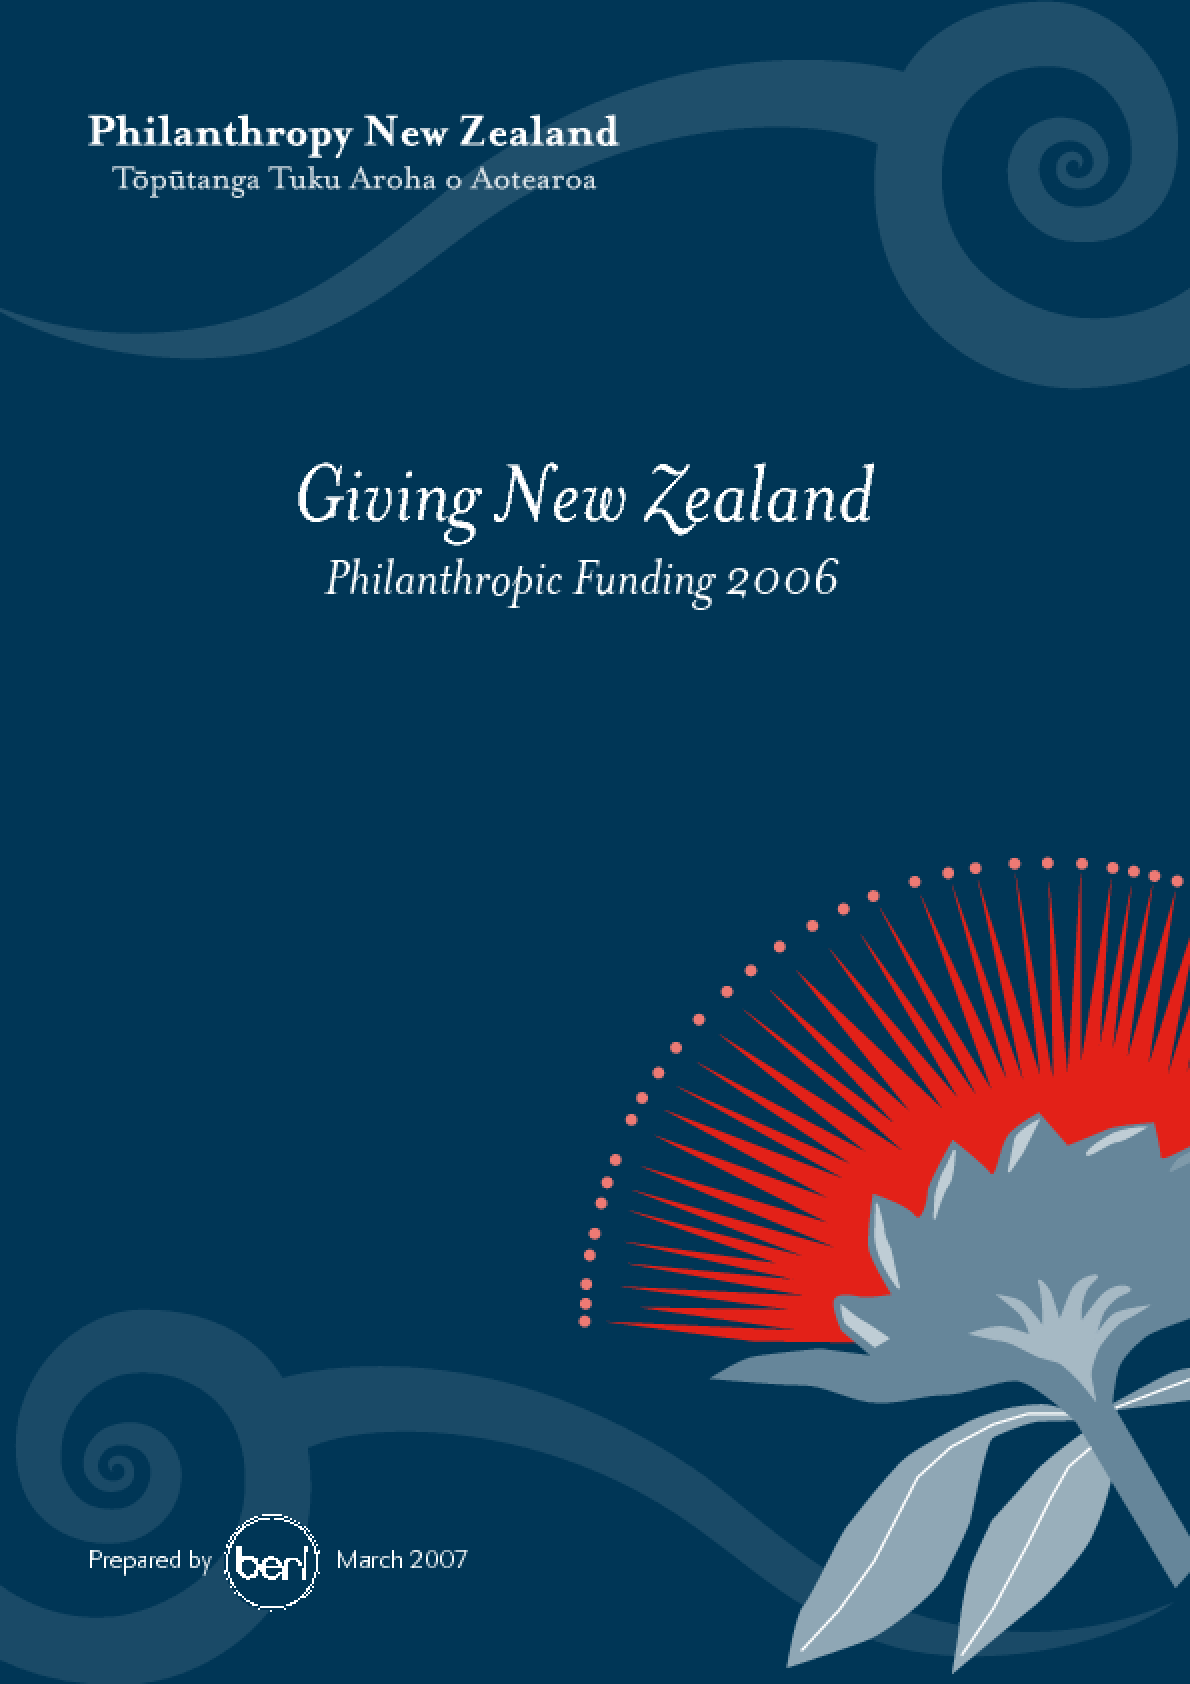 Giving New Zealand: Philanthropic Funding 2006